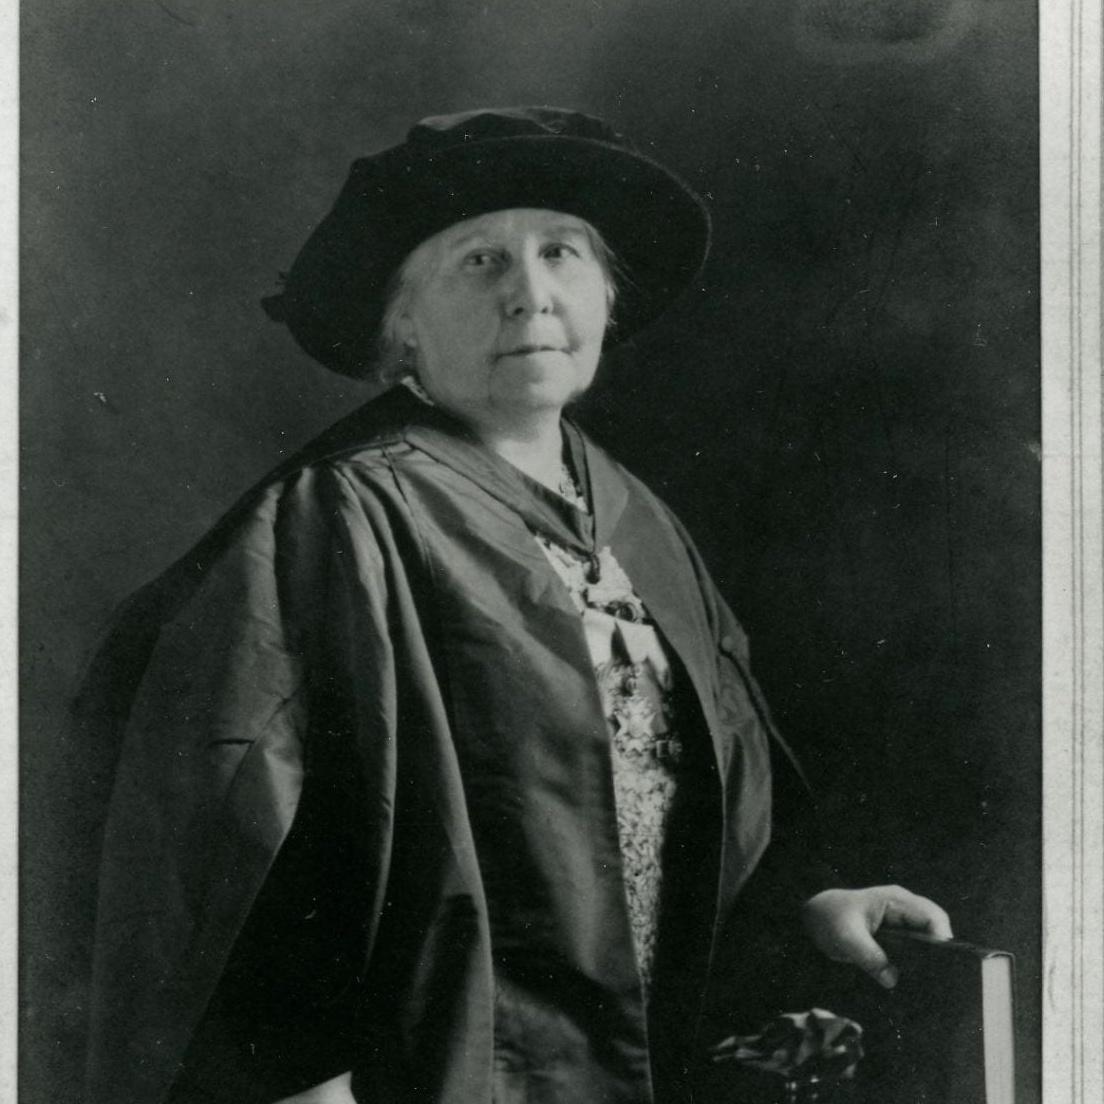 Portrait of Margaret Murrayin academic robes